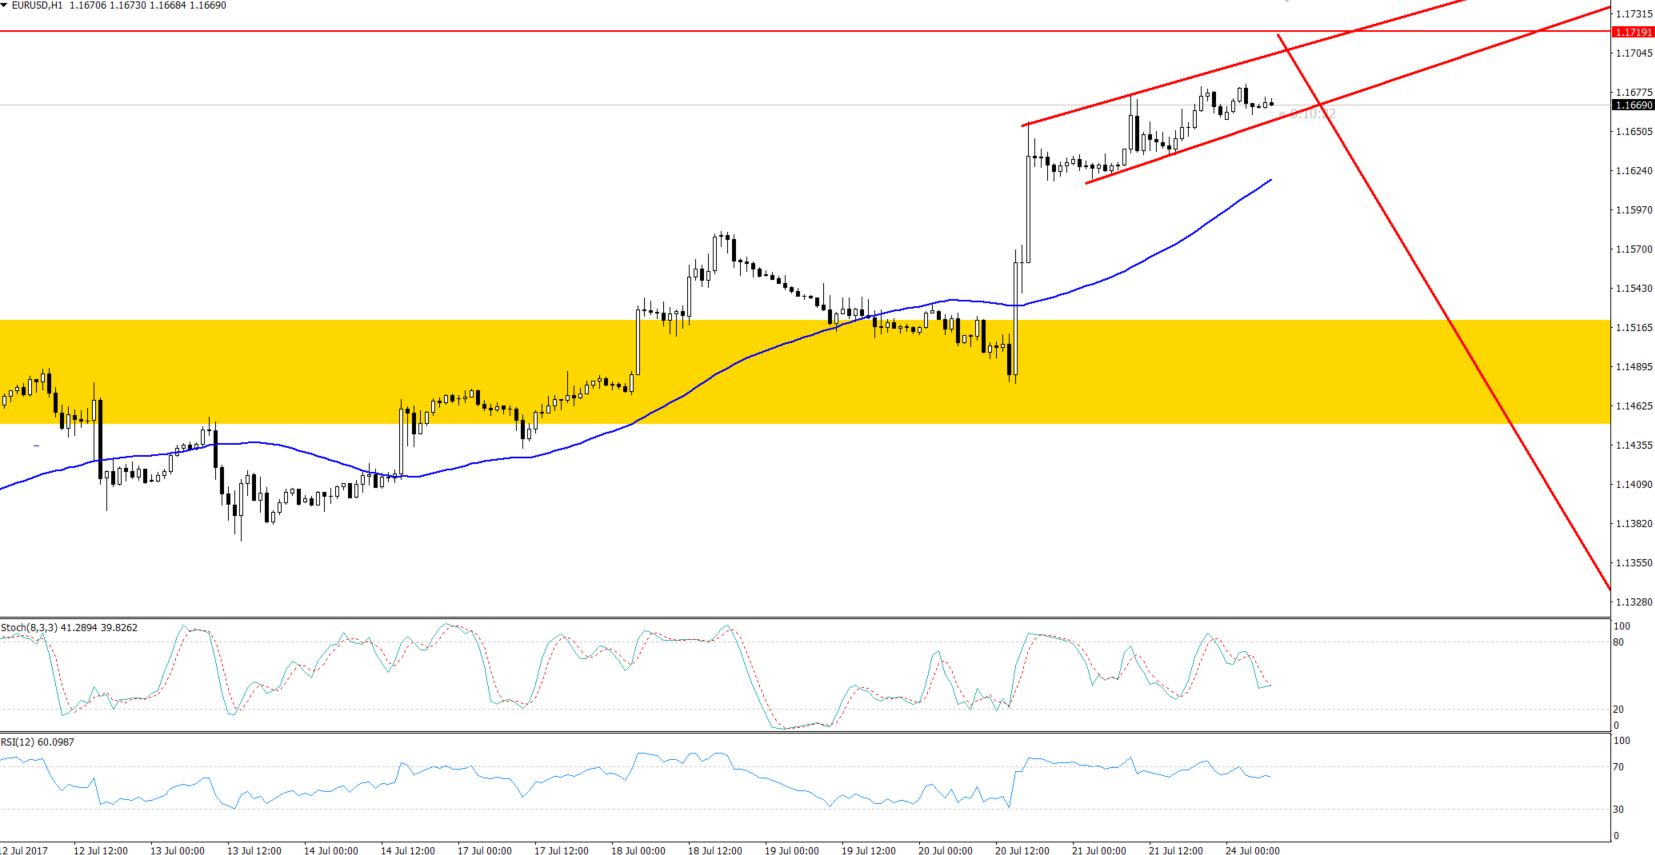 EURUSD - Hourly Chart - Horizontal Resistance